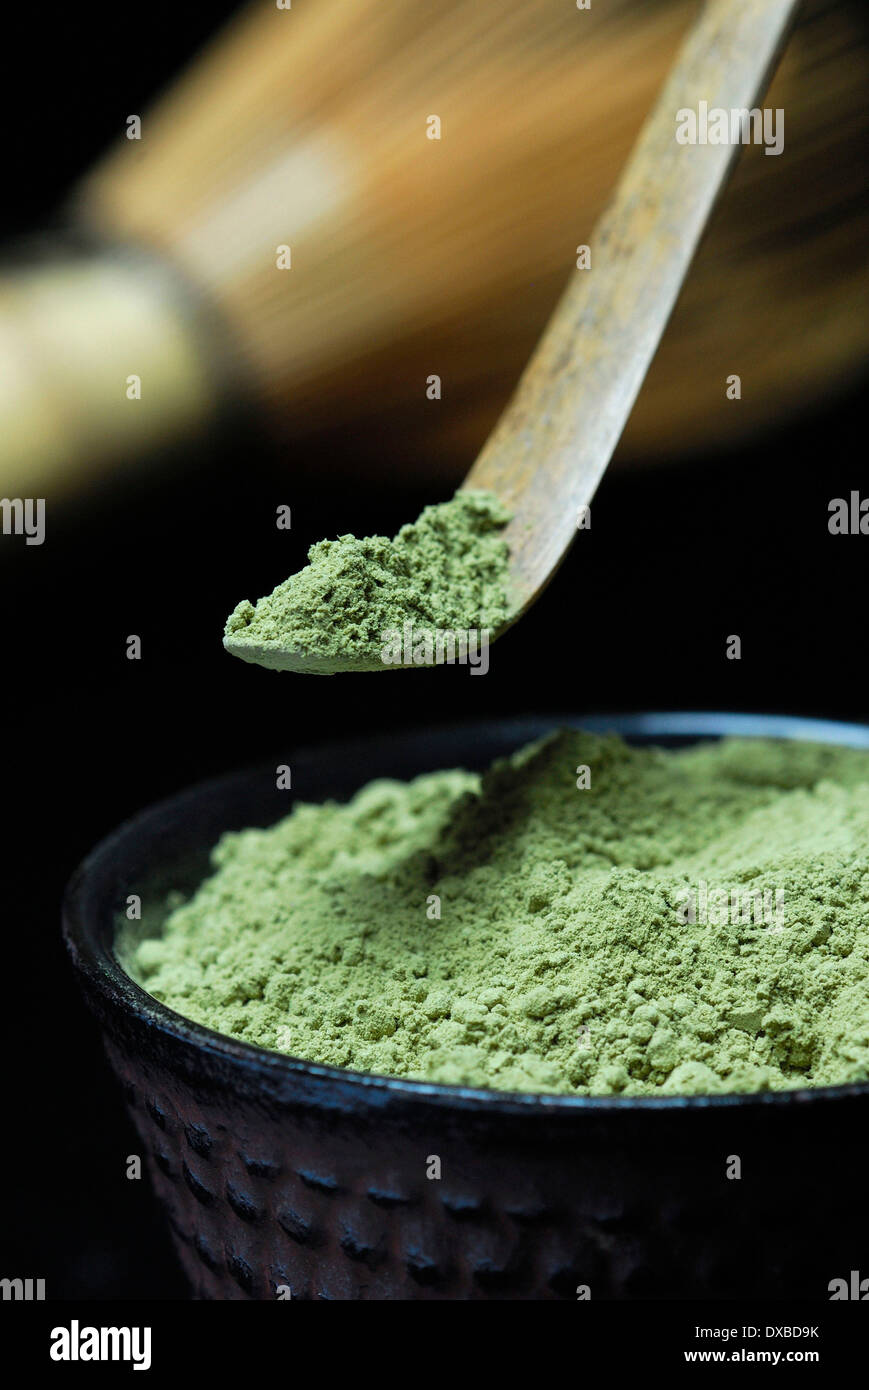 Matcha tea - Stock Image